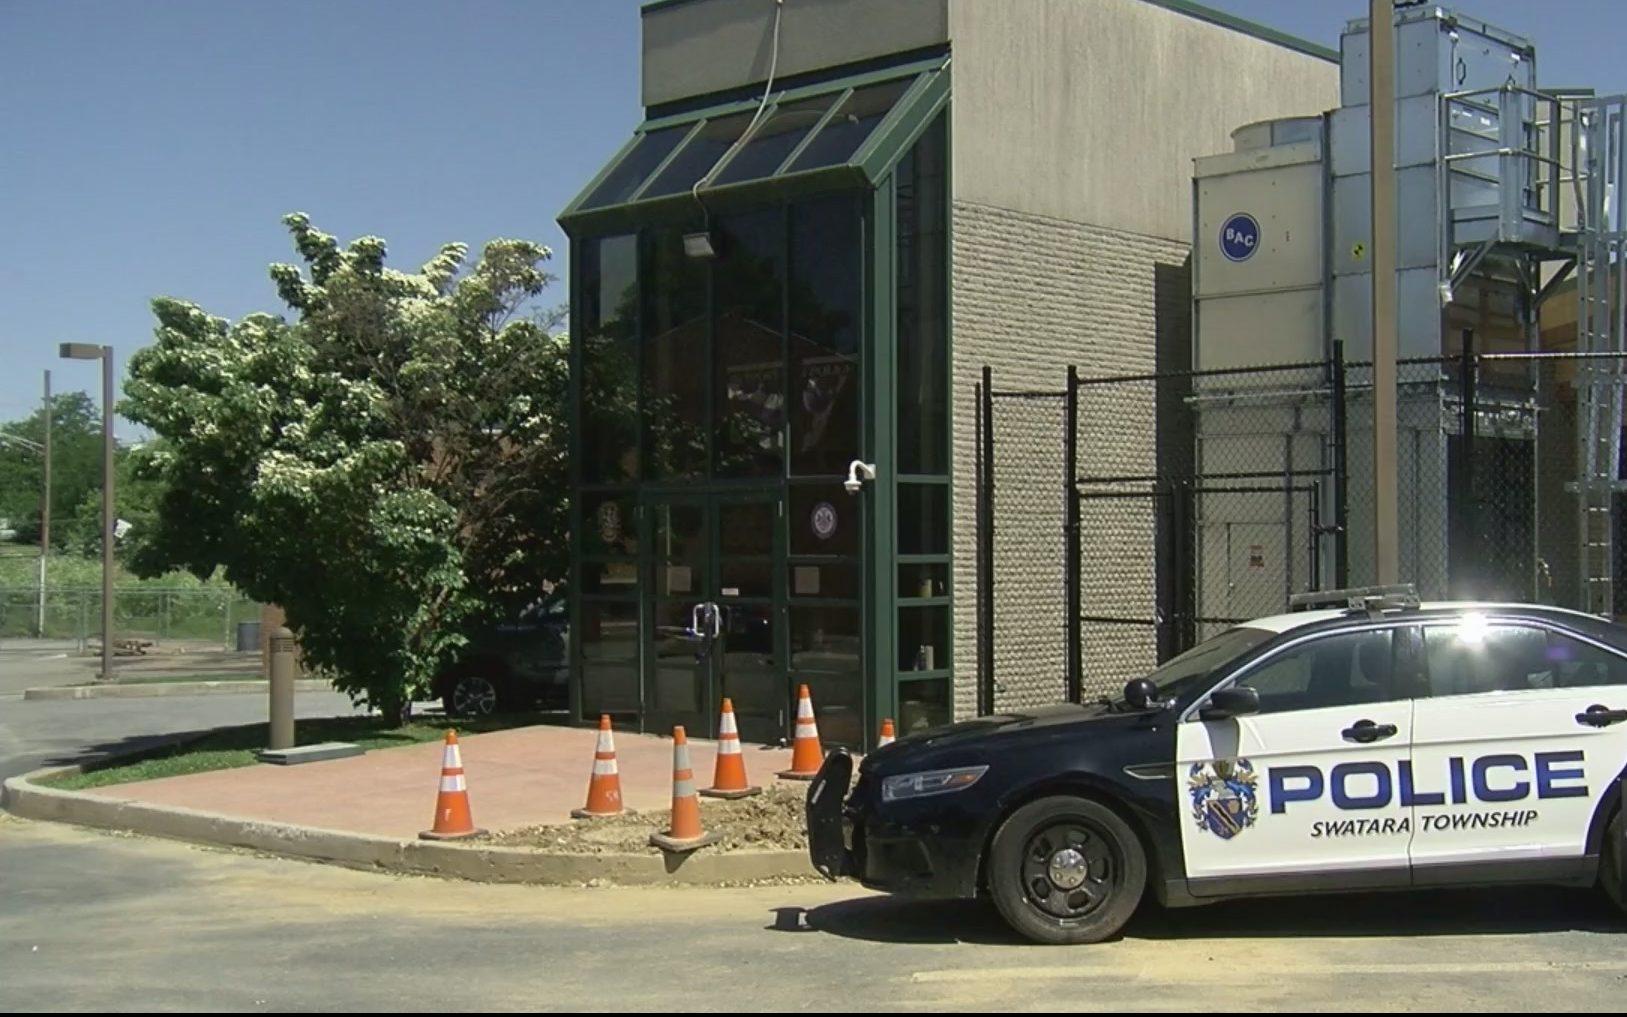 Swatara Township police to host summer youth programs